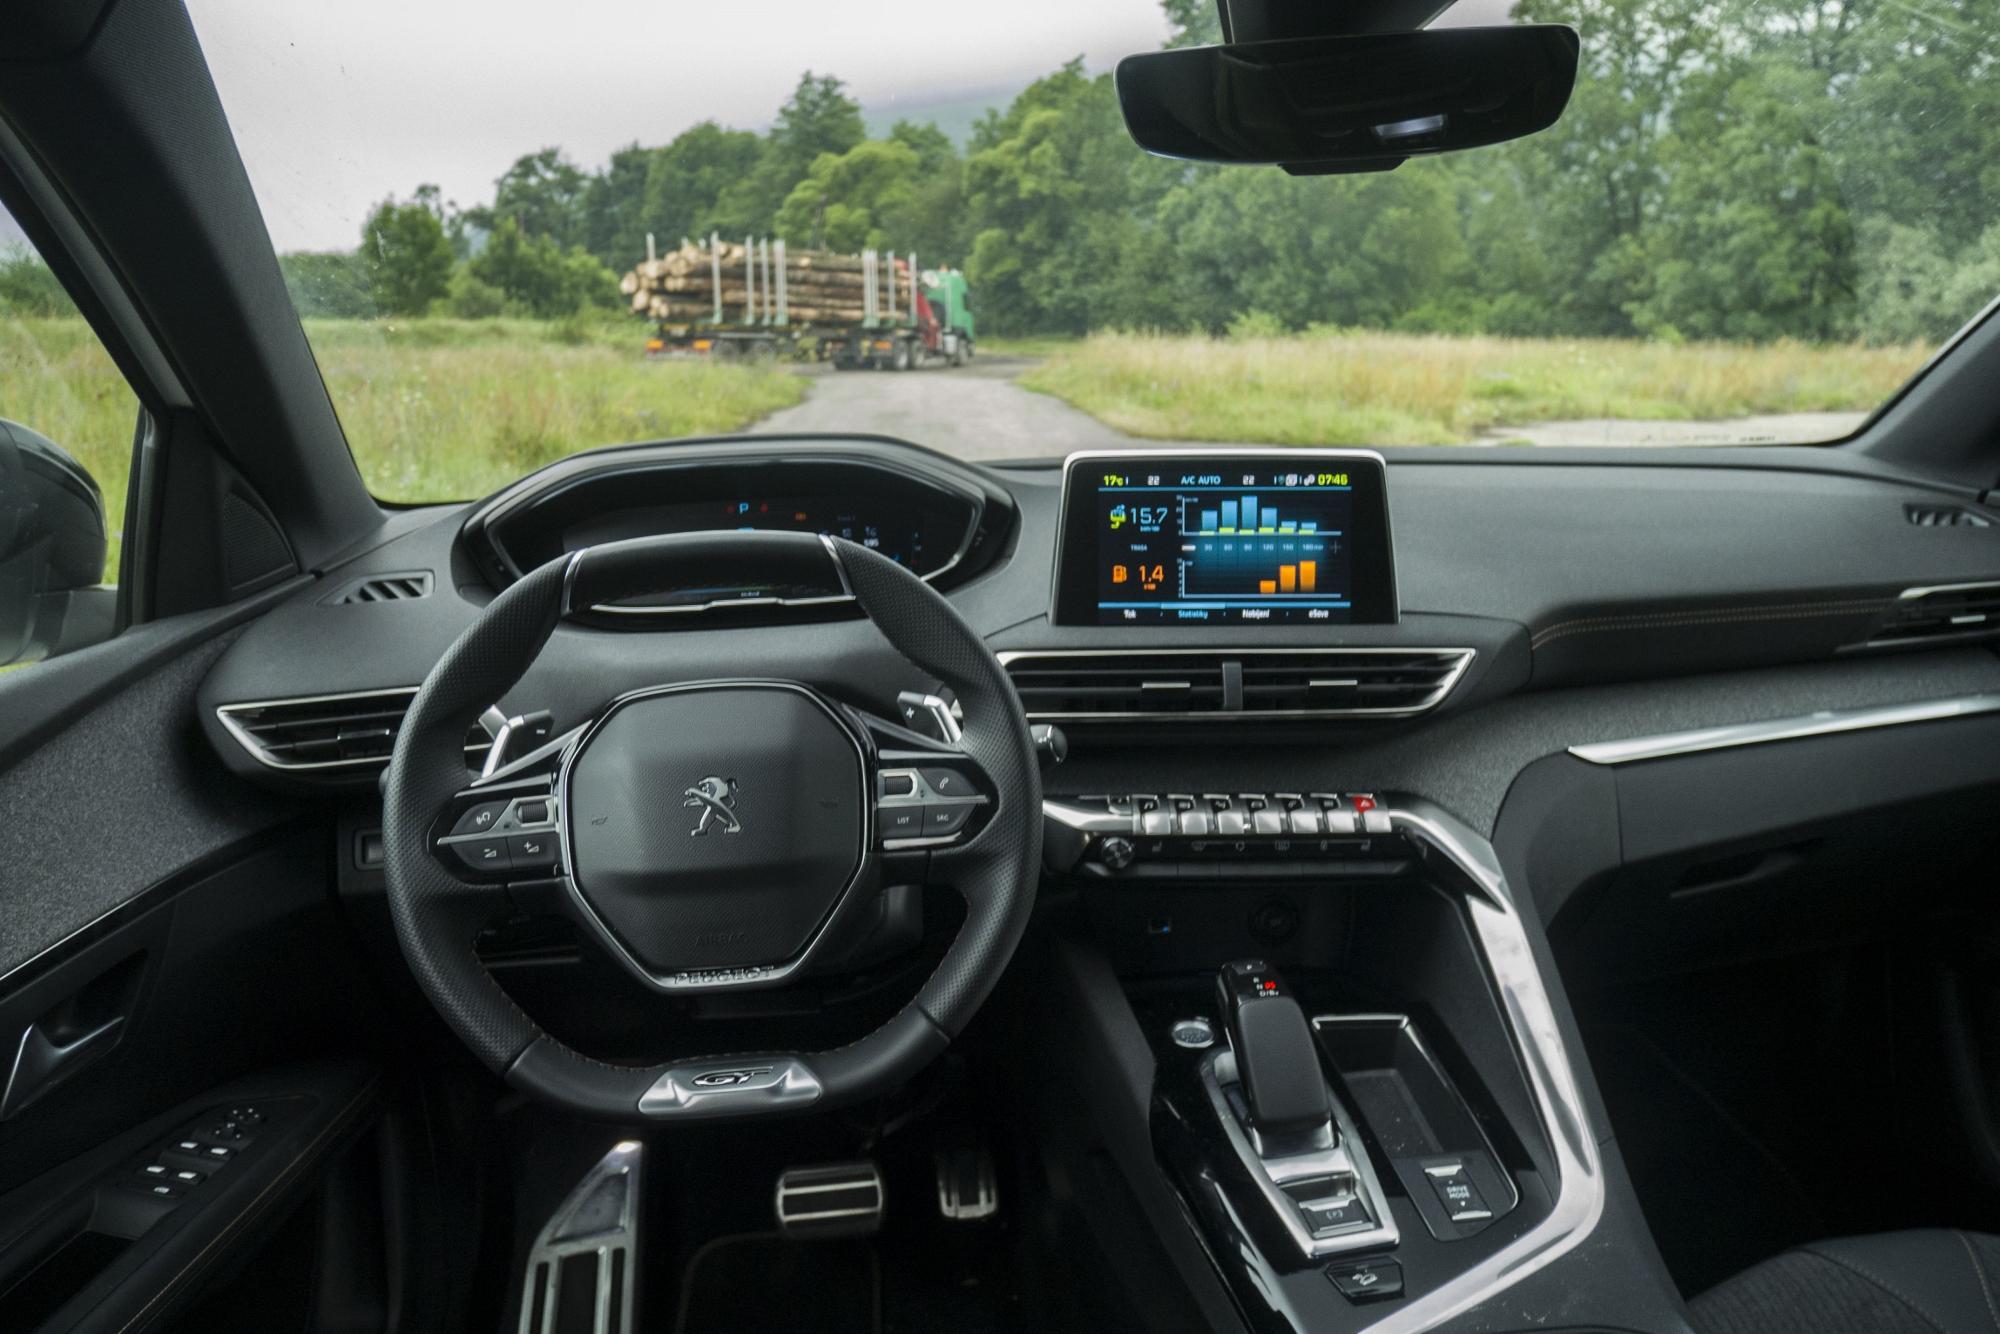 Test: Peugeot 3008 posúva schopnosti plug in hybridov kpDOsd6f5D peugeot-3008-hybrid4-8